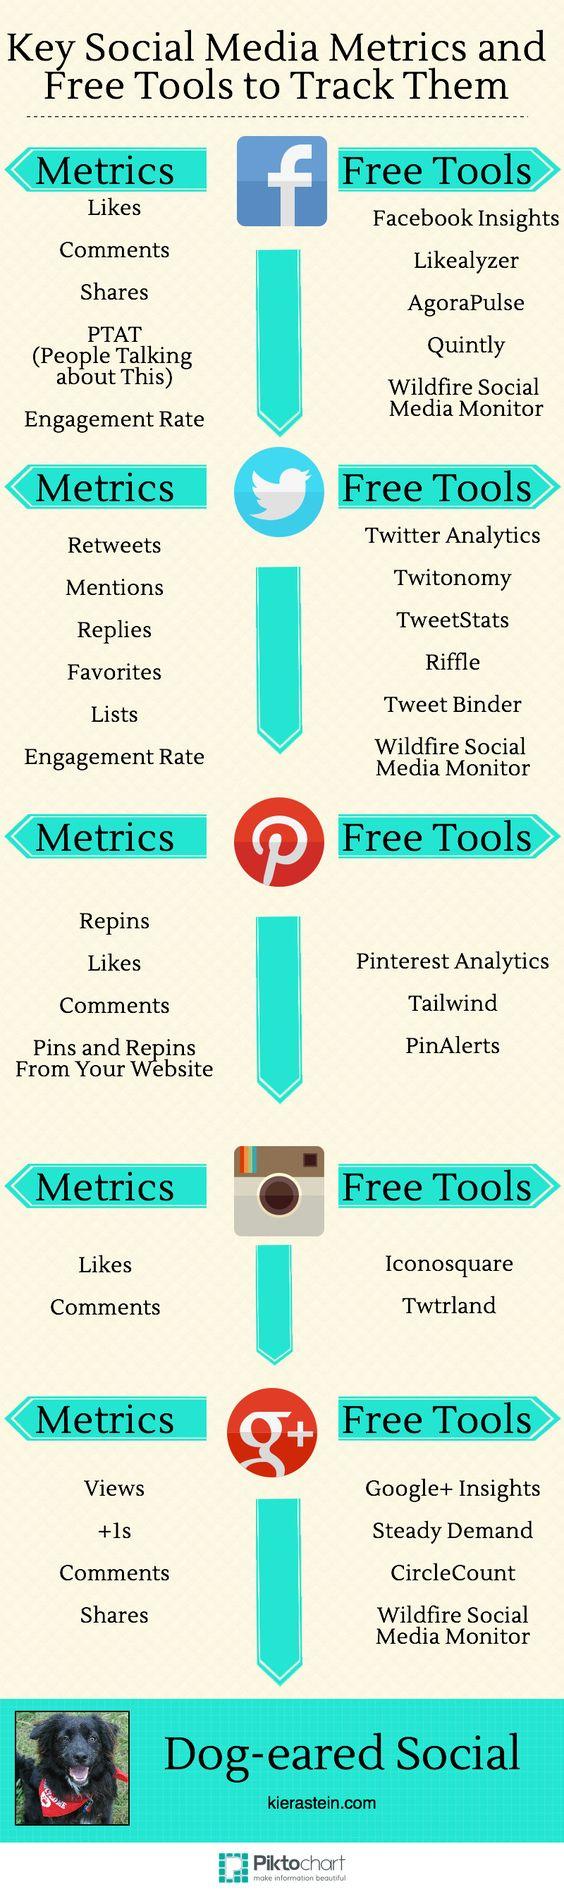 The best free tools to measure key #socialmedia metrics on Facebook, Twitter…  #RePin by AT Social Media Marketing - Pinterest Marketing Specialists ATSocialMedia.co.uk